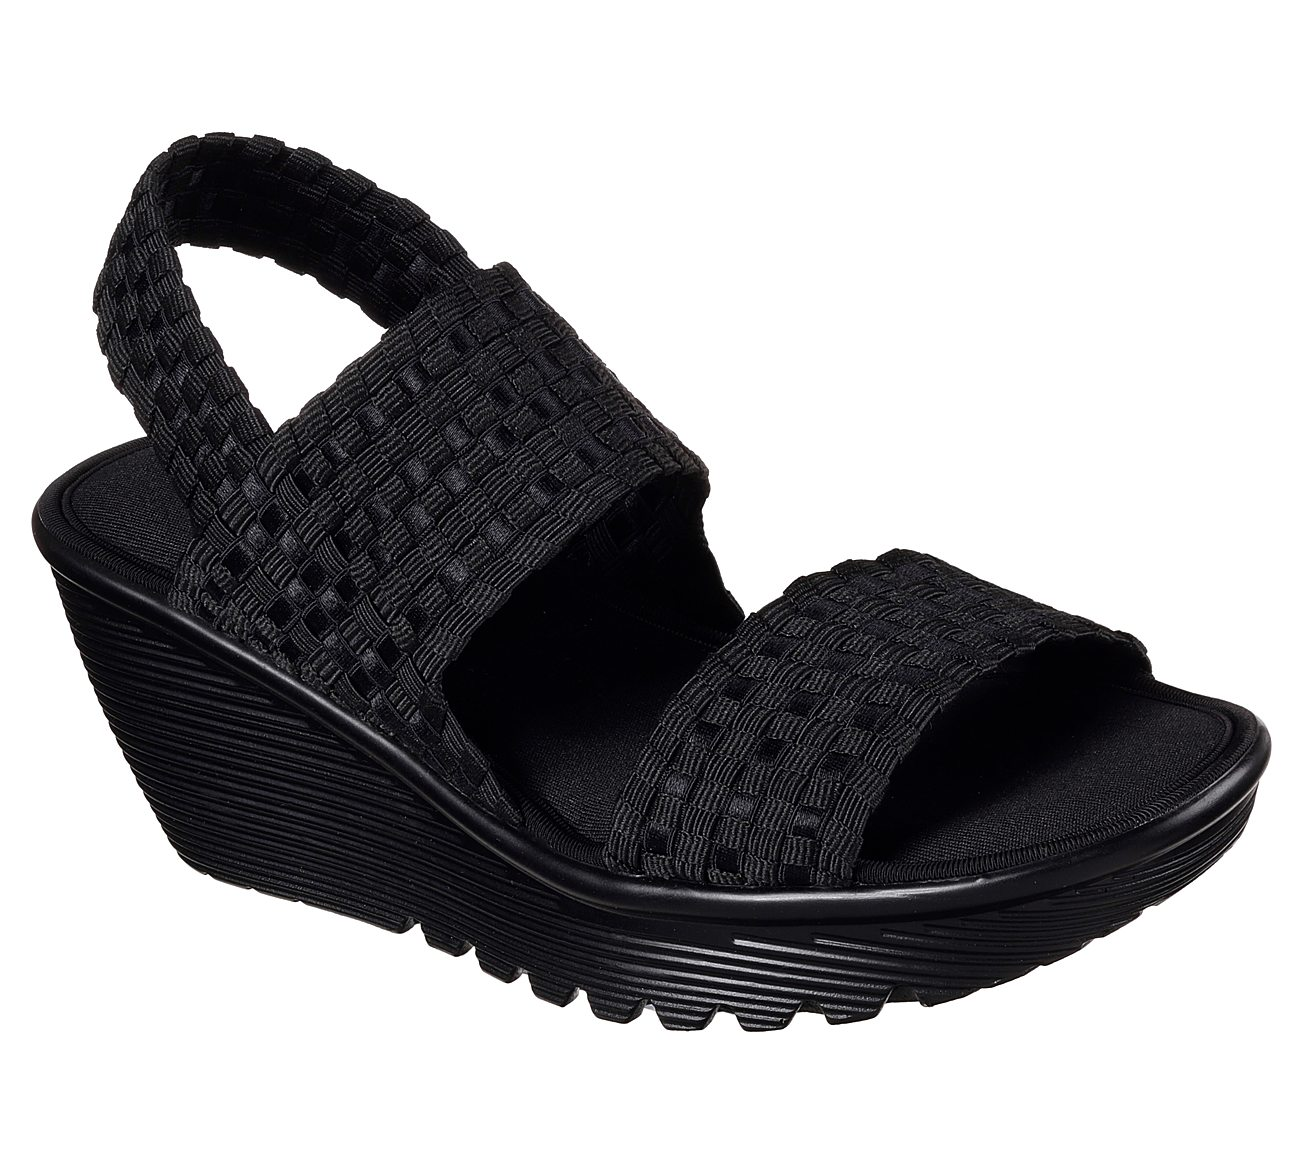 eca2b09bf4b6 Buy SKECHERS Parallel - Tumbleweave Cali Shoes only  55.00